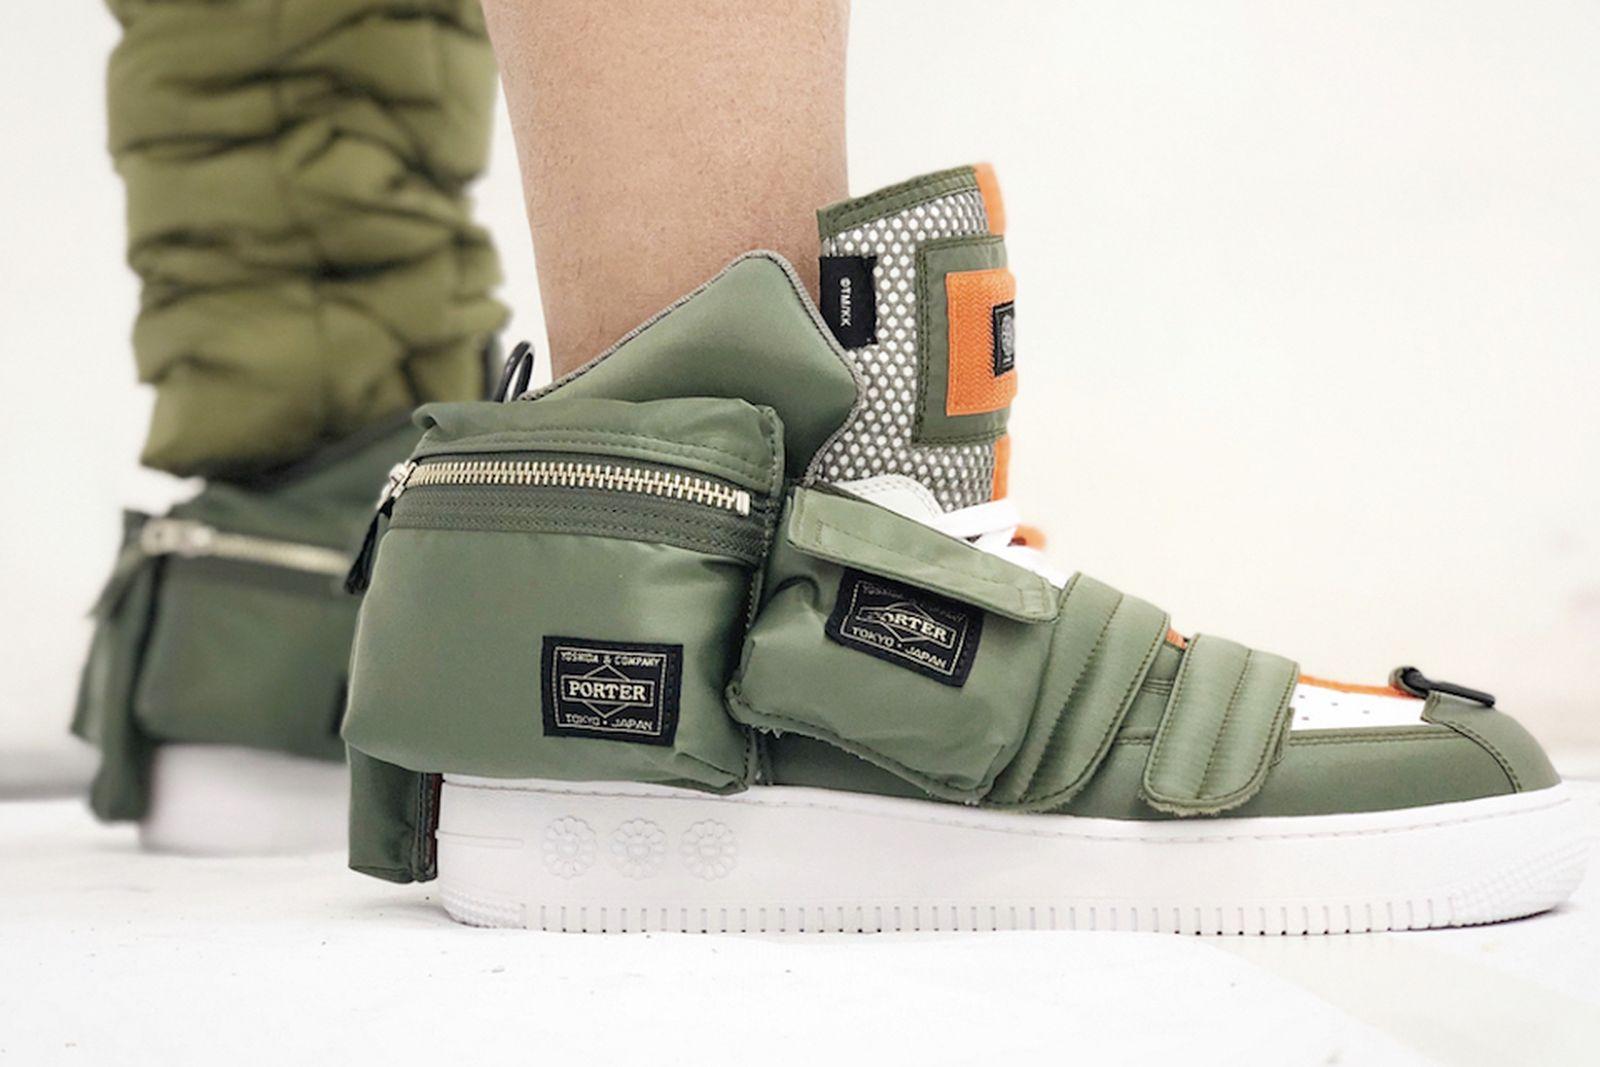 takashi murakami porter kaikai kiki sneaker release date price info